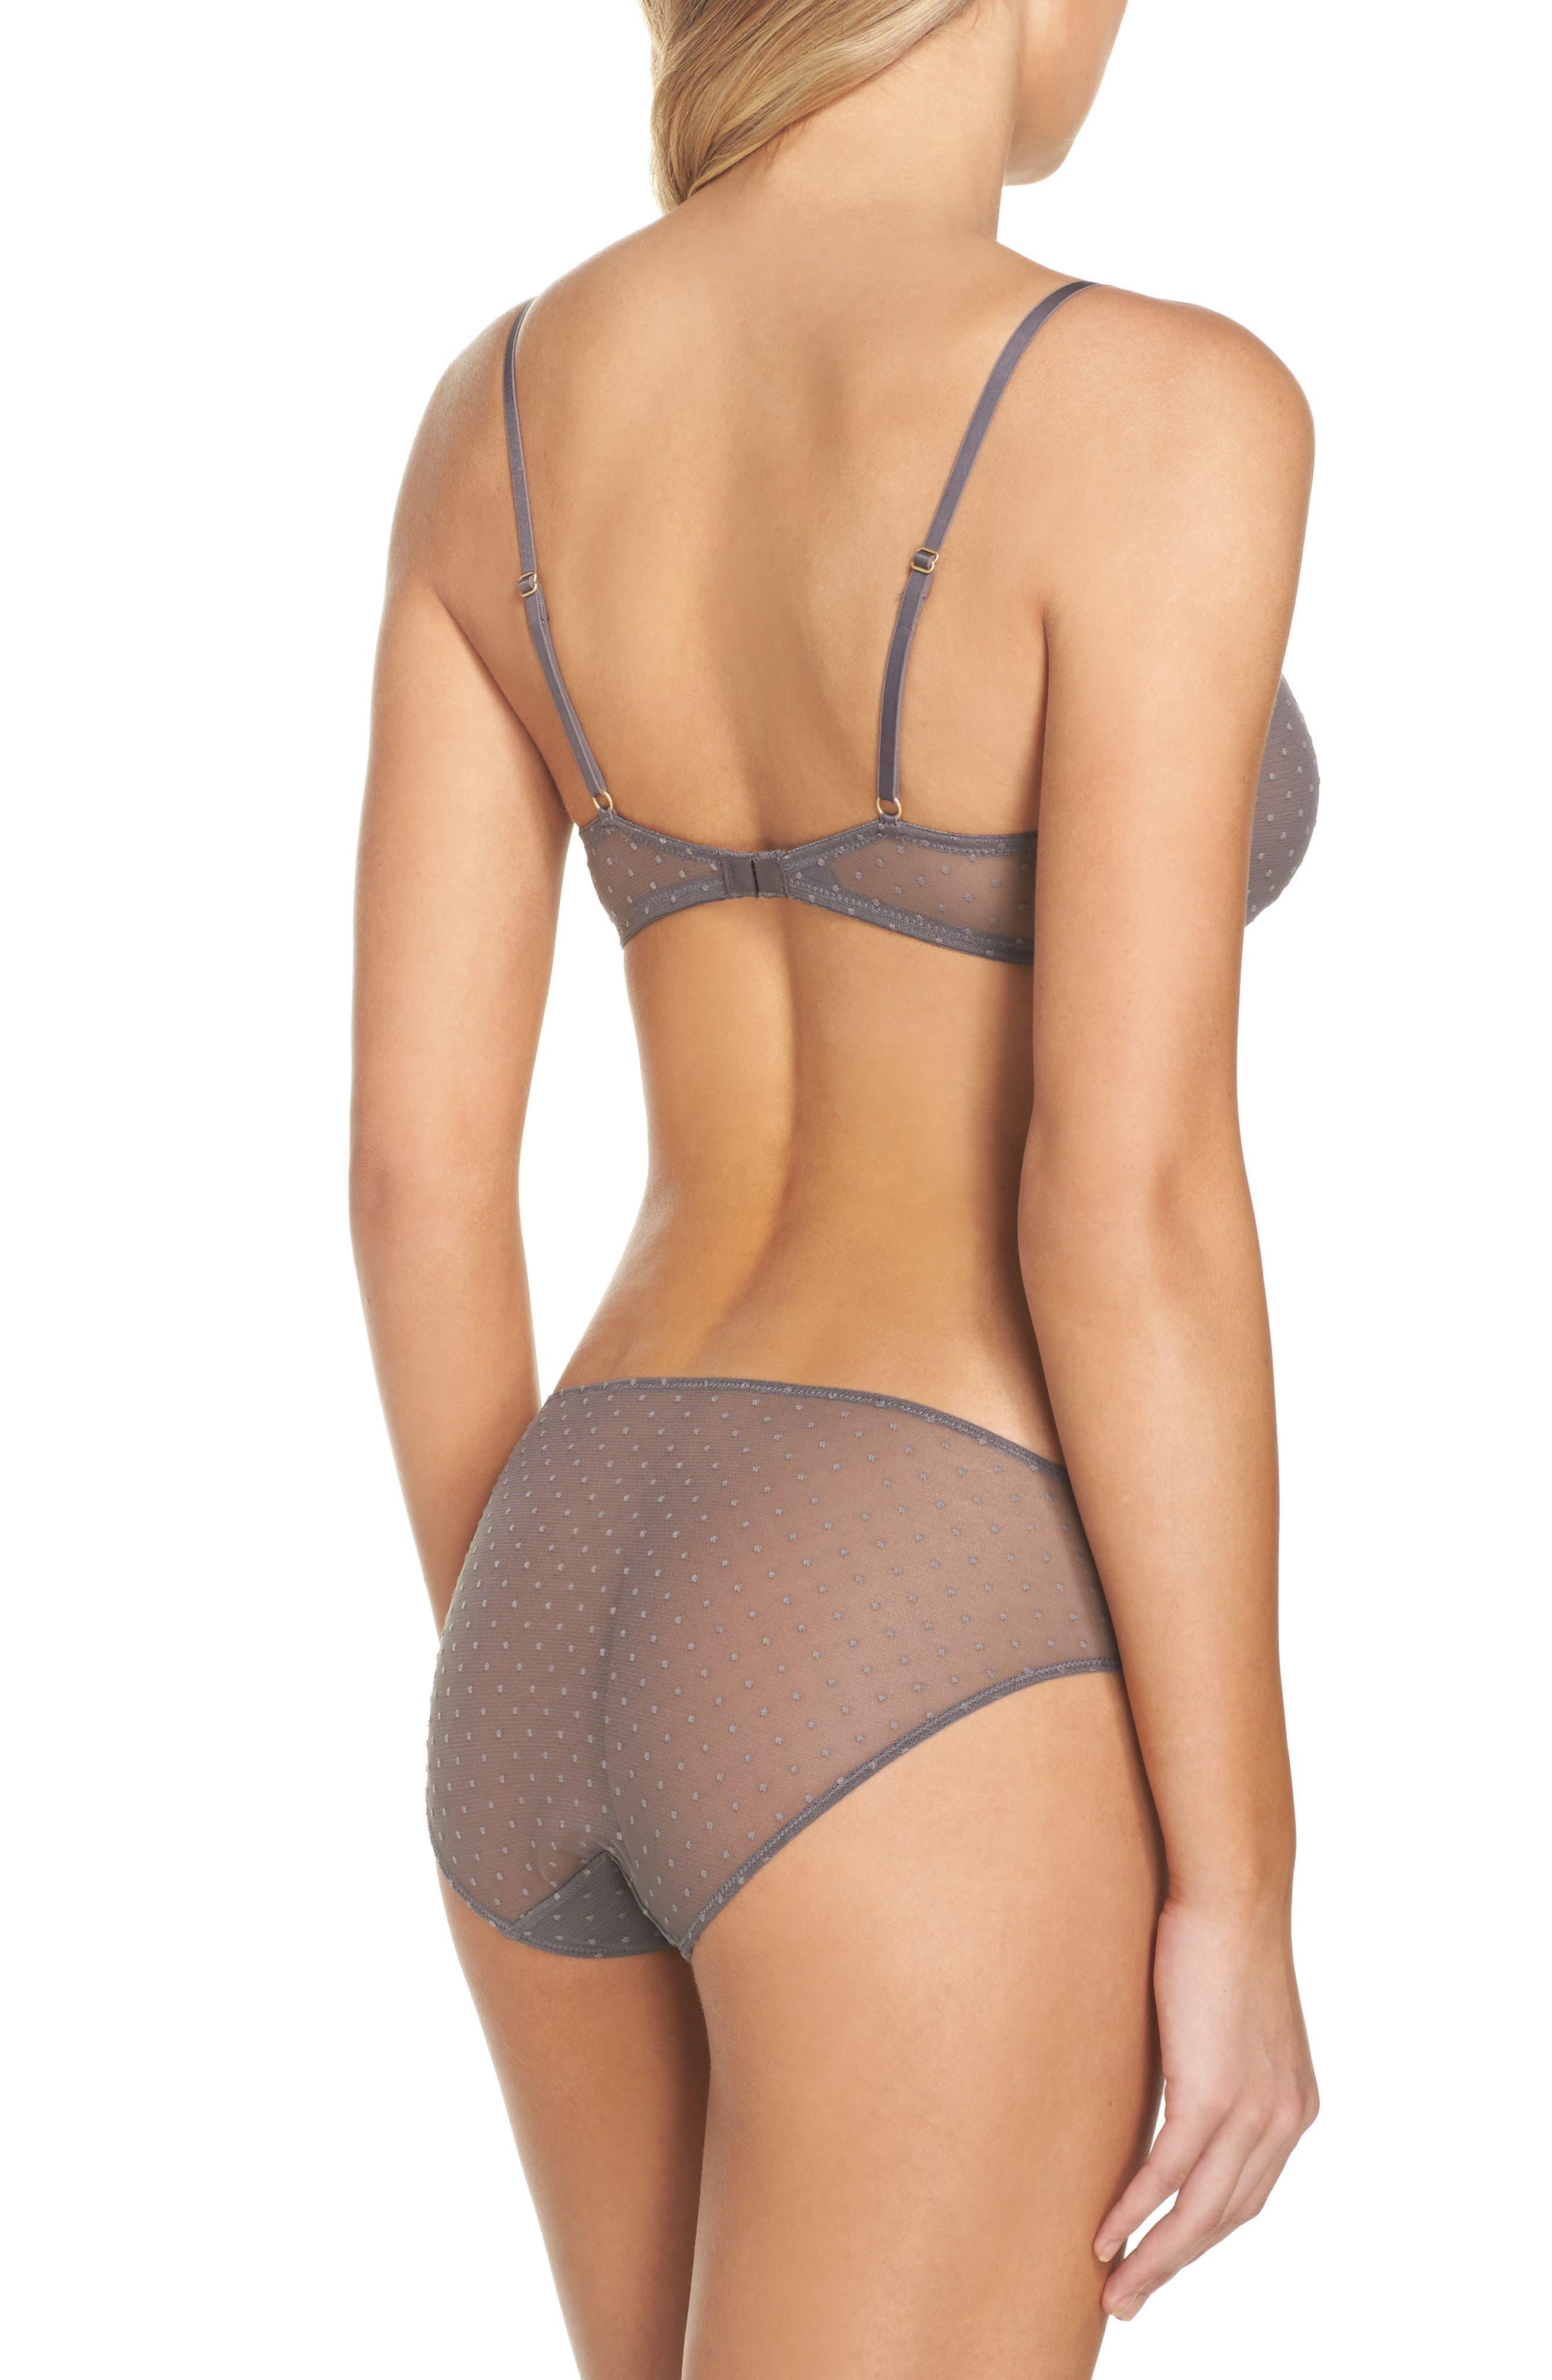 Swiss Dot Bikini,                             Alternate thumbnail 6, color,                             Grey Evening